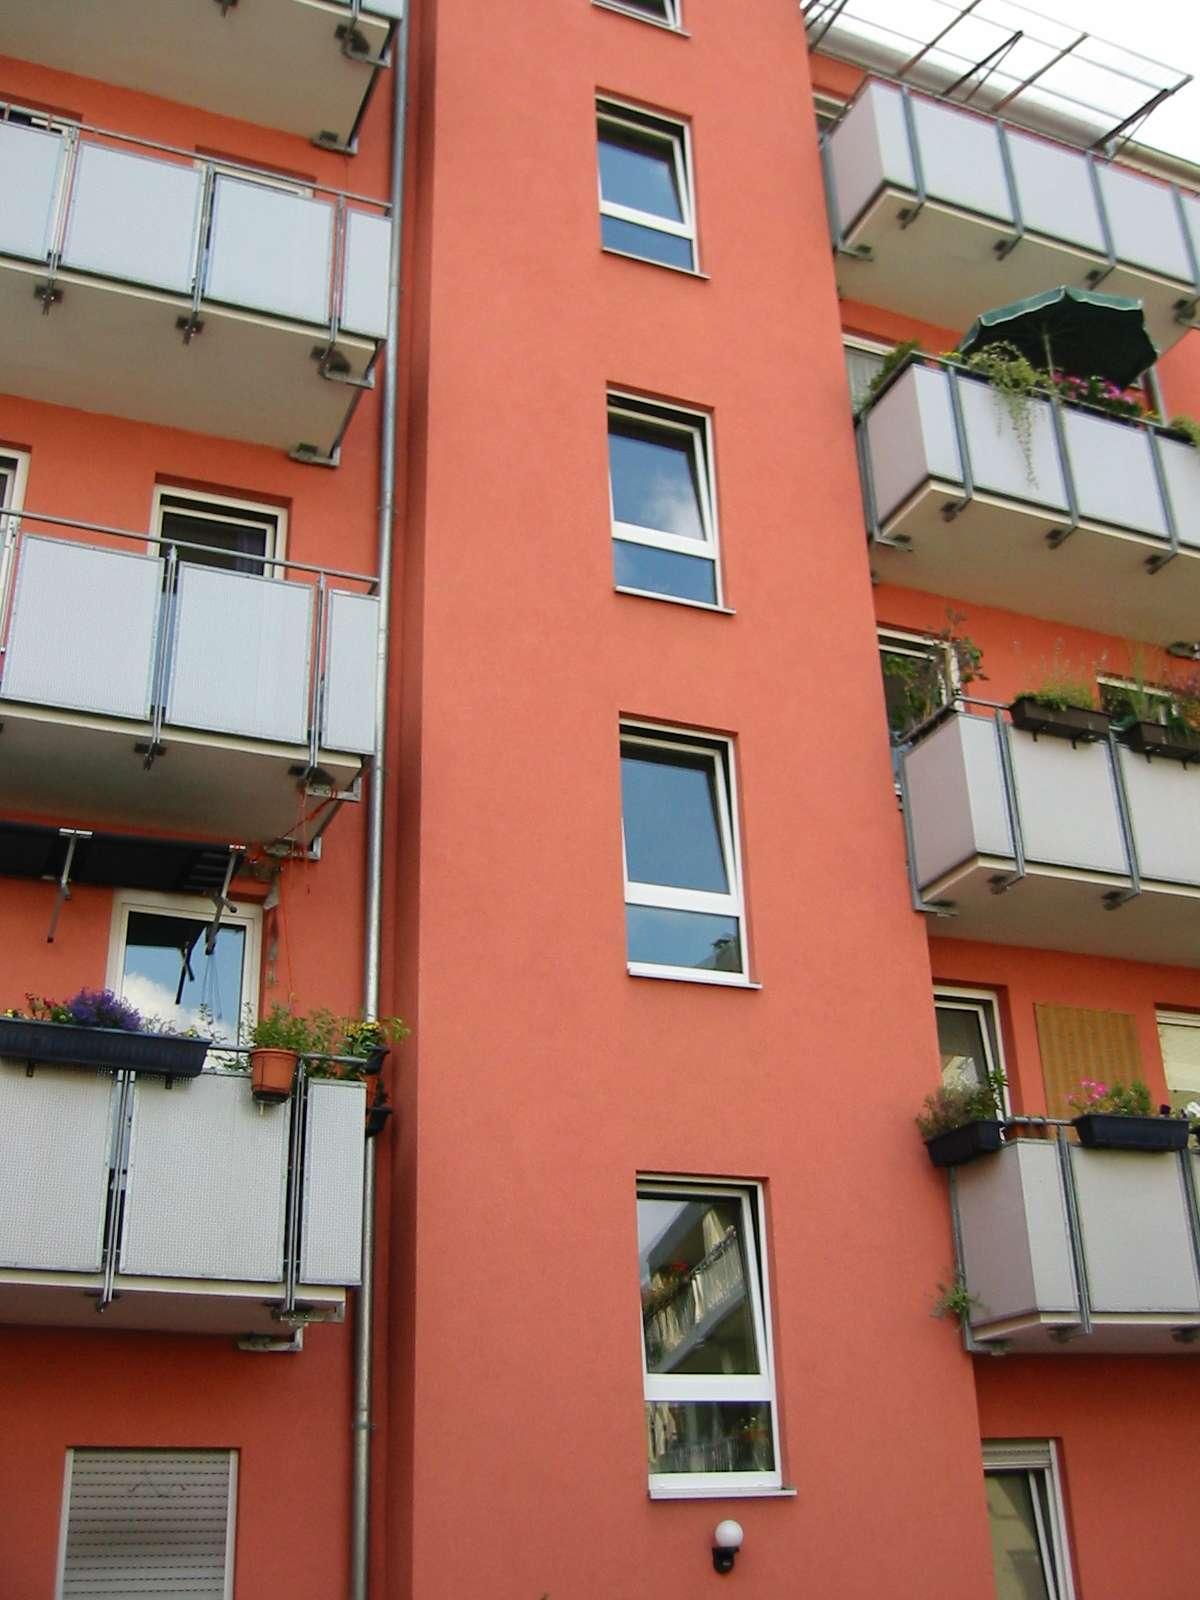 3-Zi-Whg mit Balkon, Holzdielenböden, Nbg-Südstadt Nähe ehem. Kaufhof, 30iger Zone, für 1-2 Personen in Galgenhof (Nürnberg)